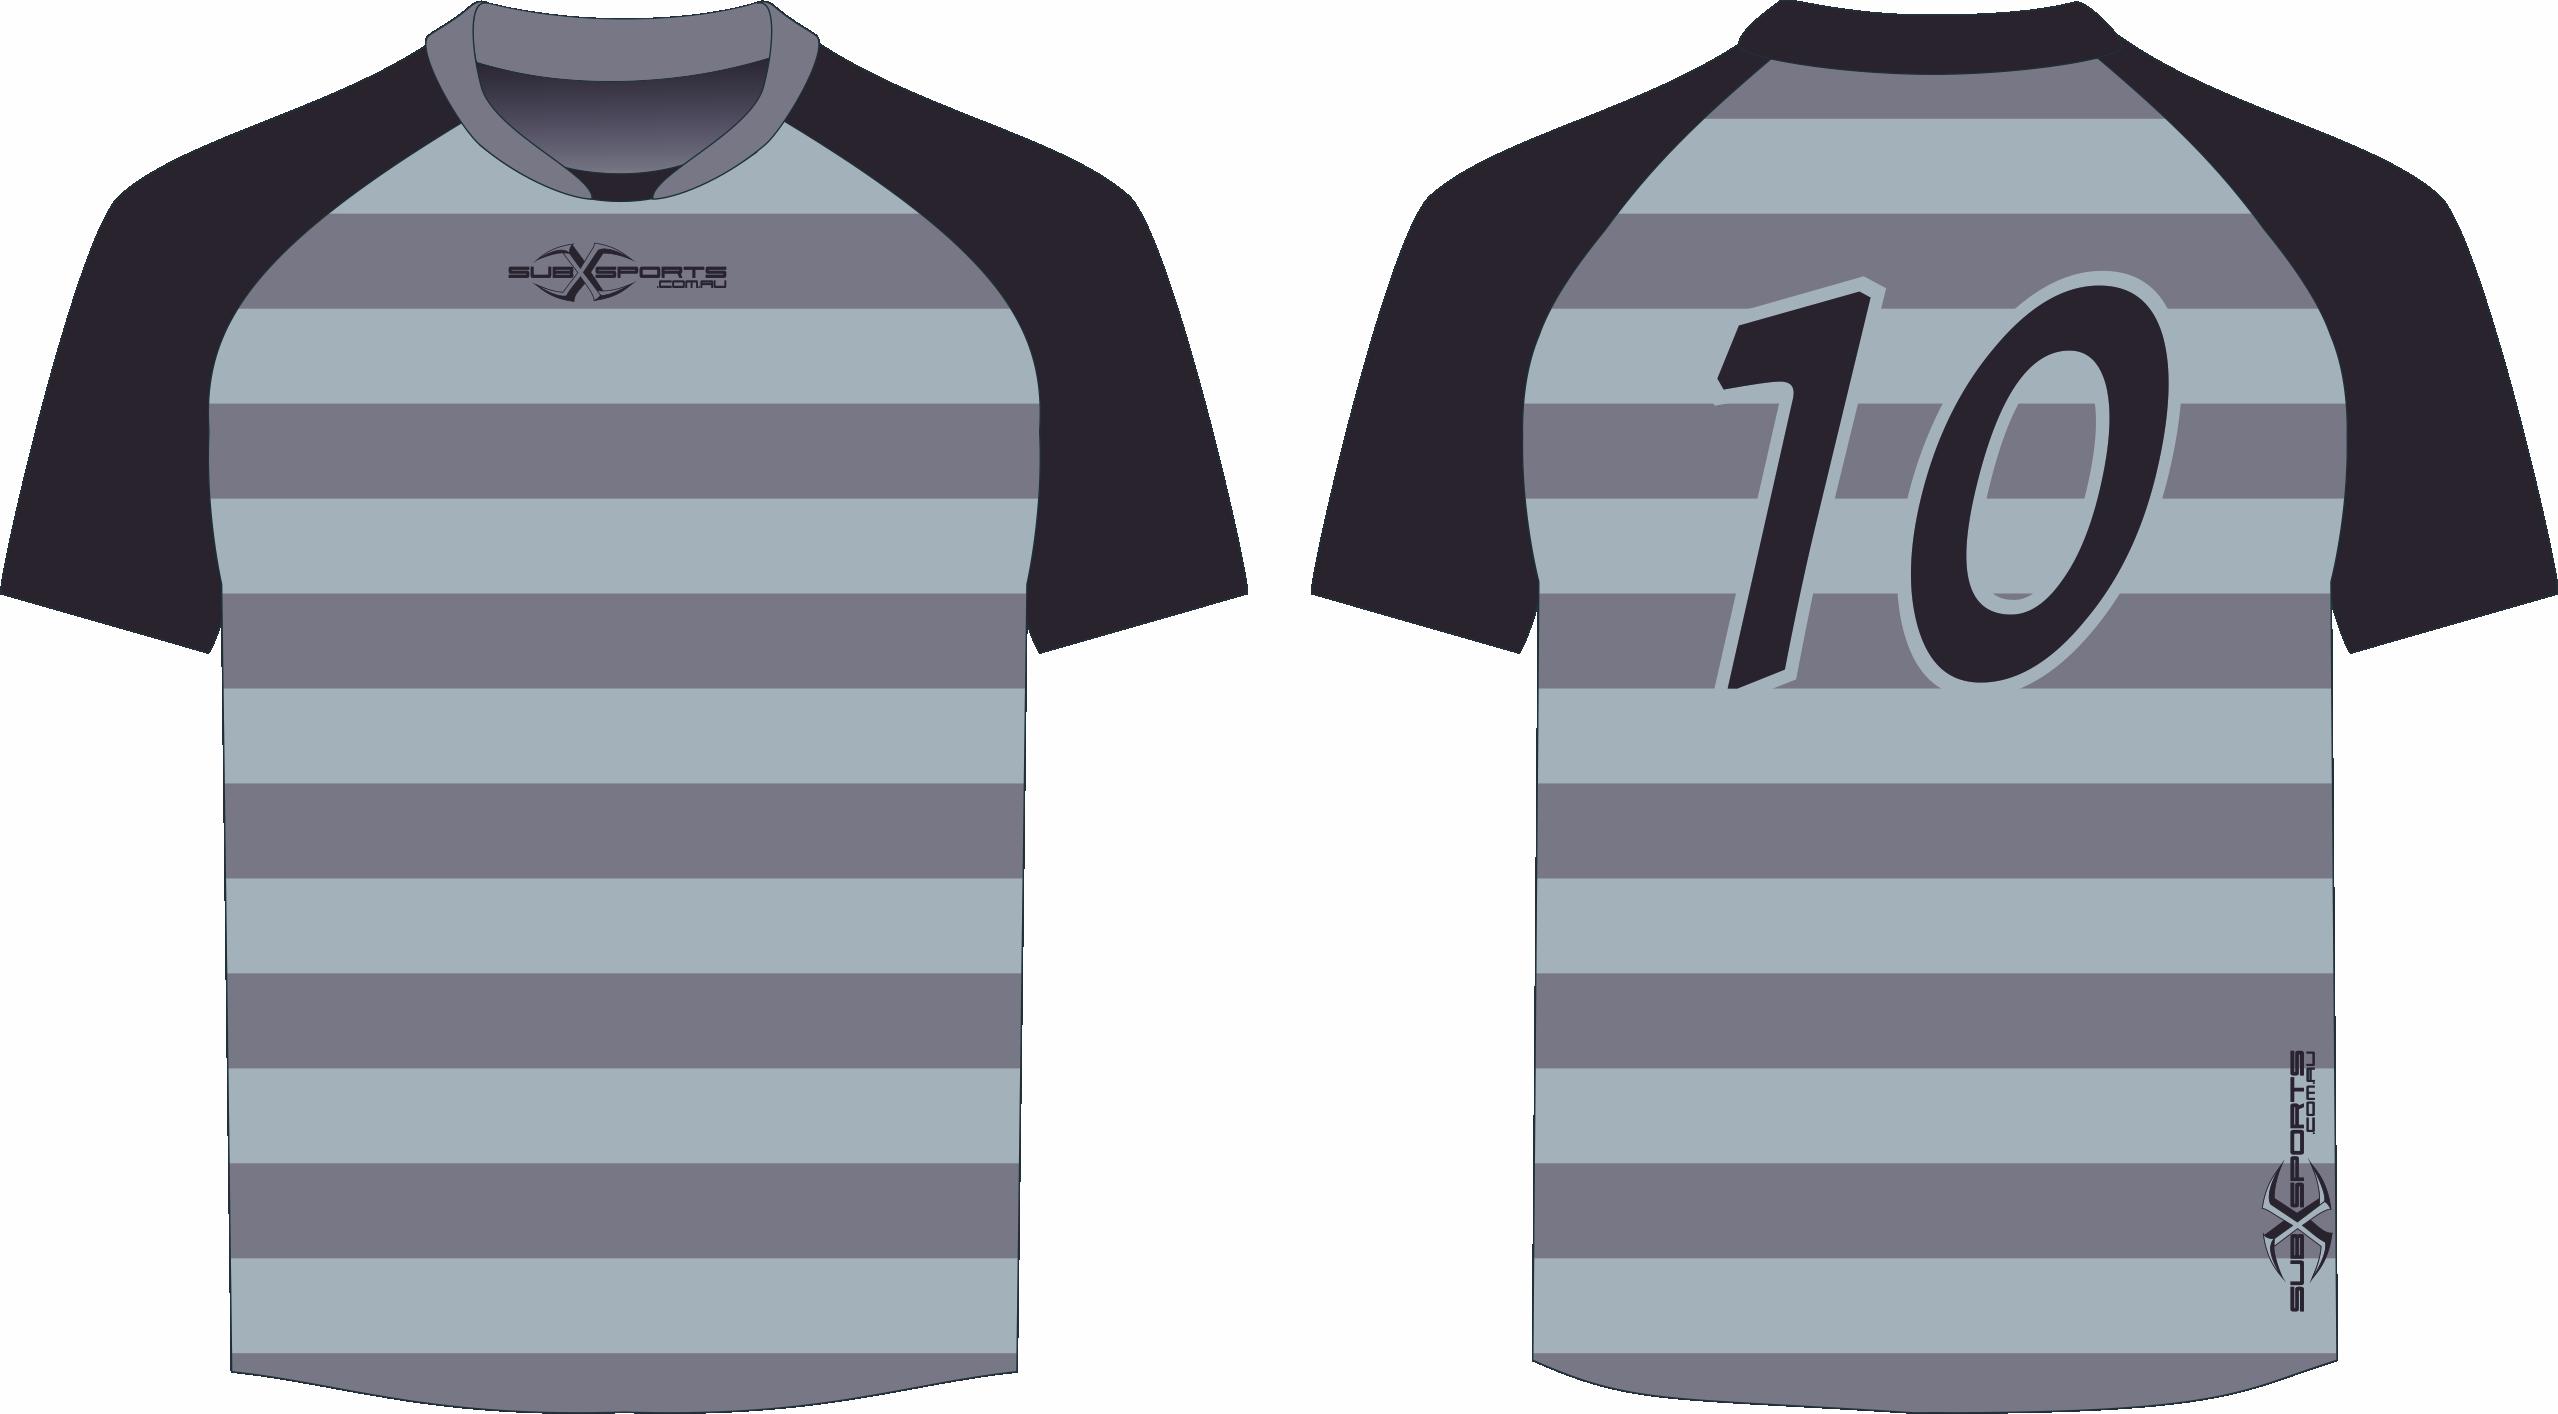 S202XJ Jersey Grey Silver Black.png